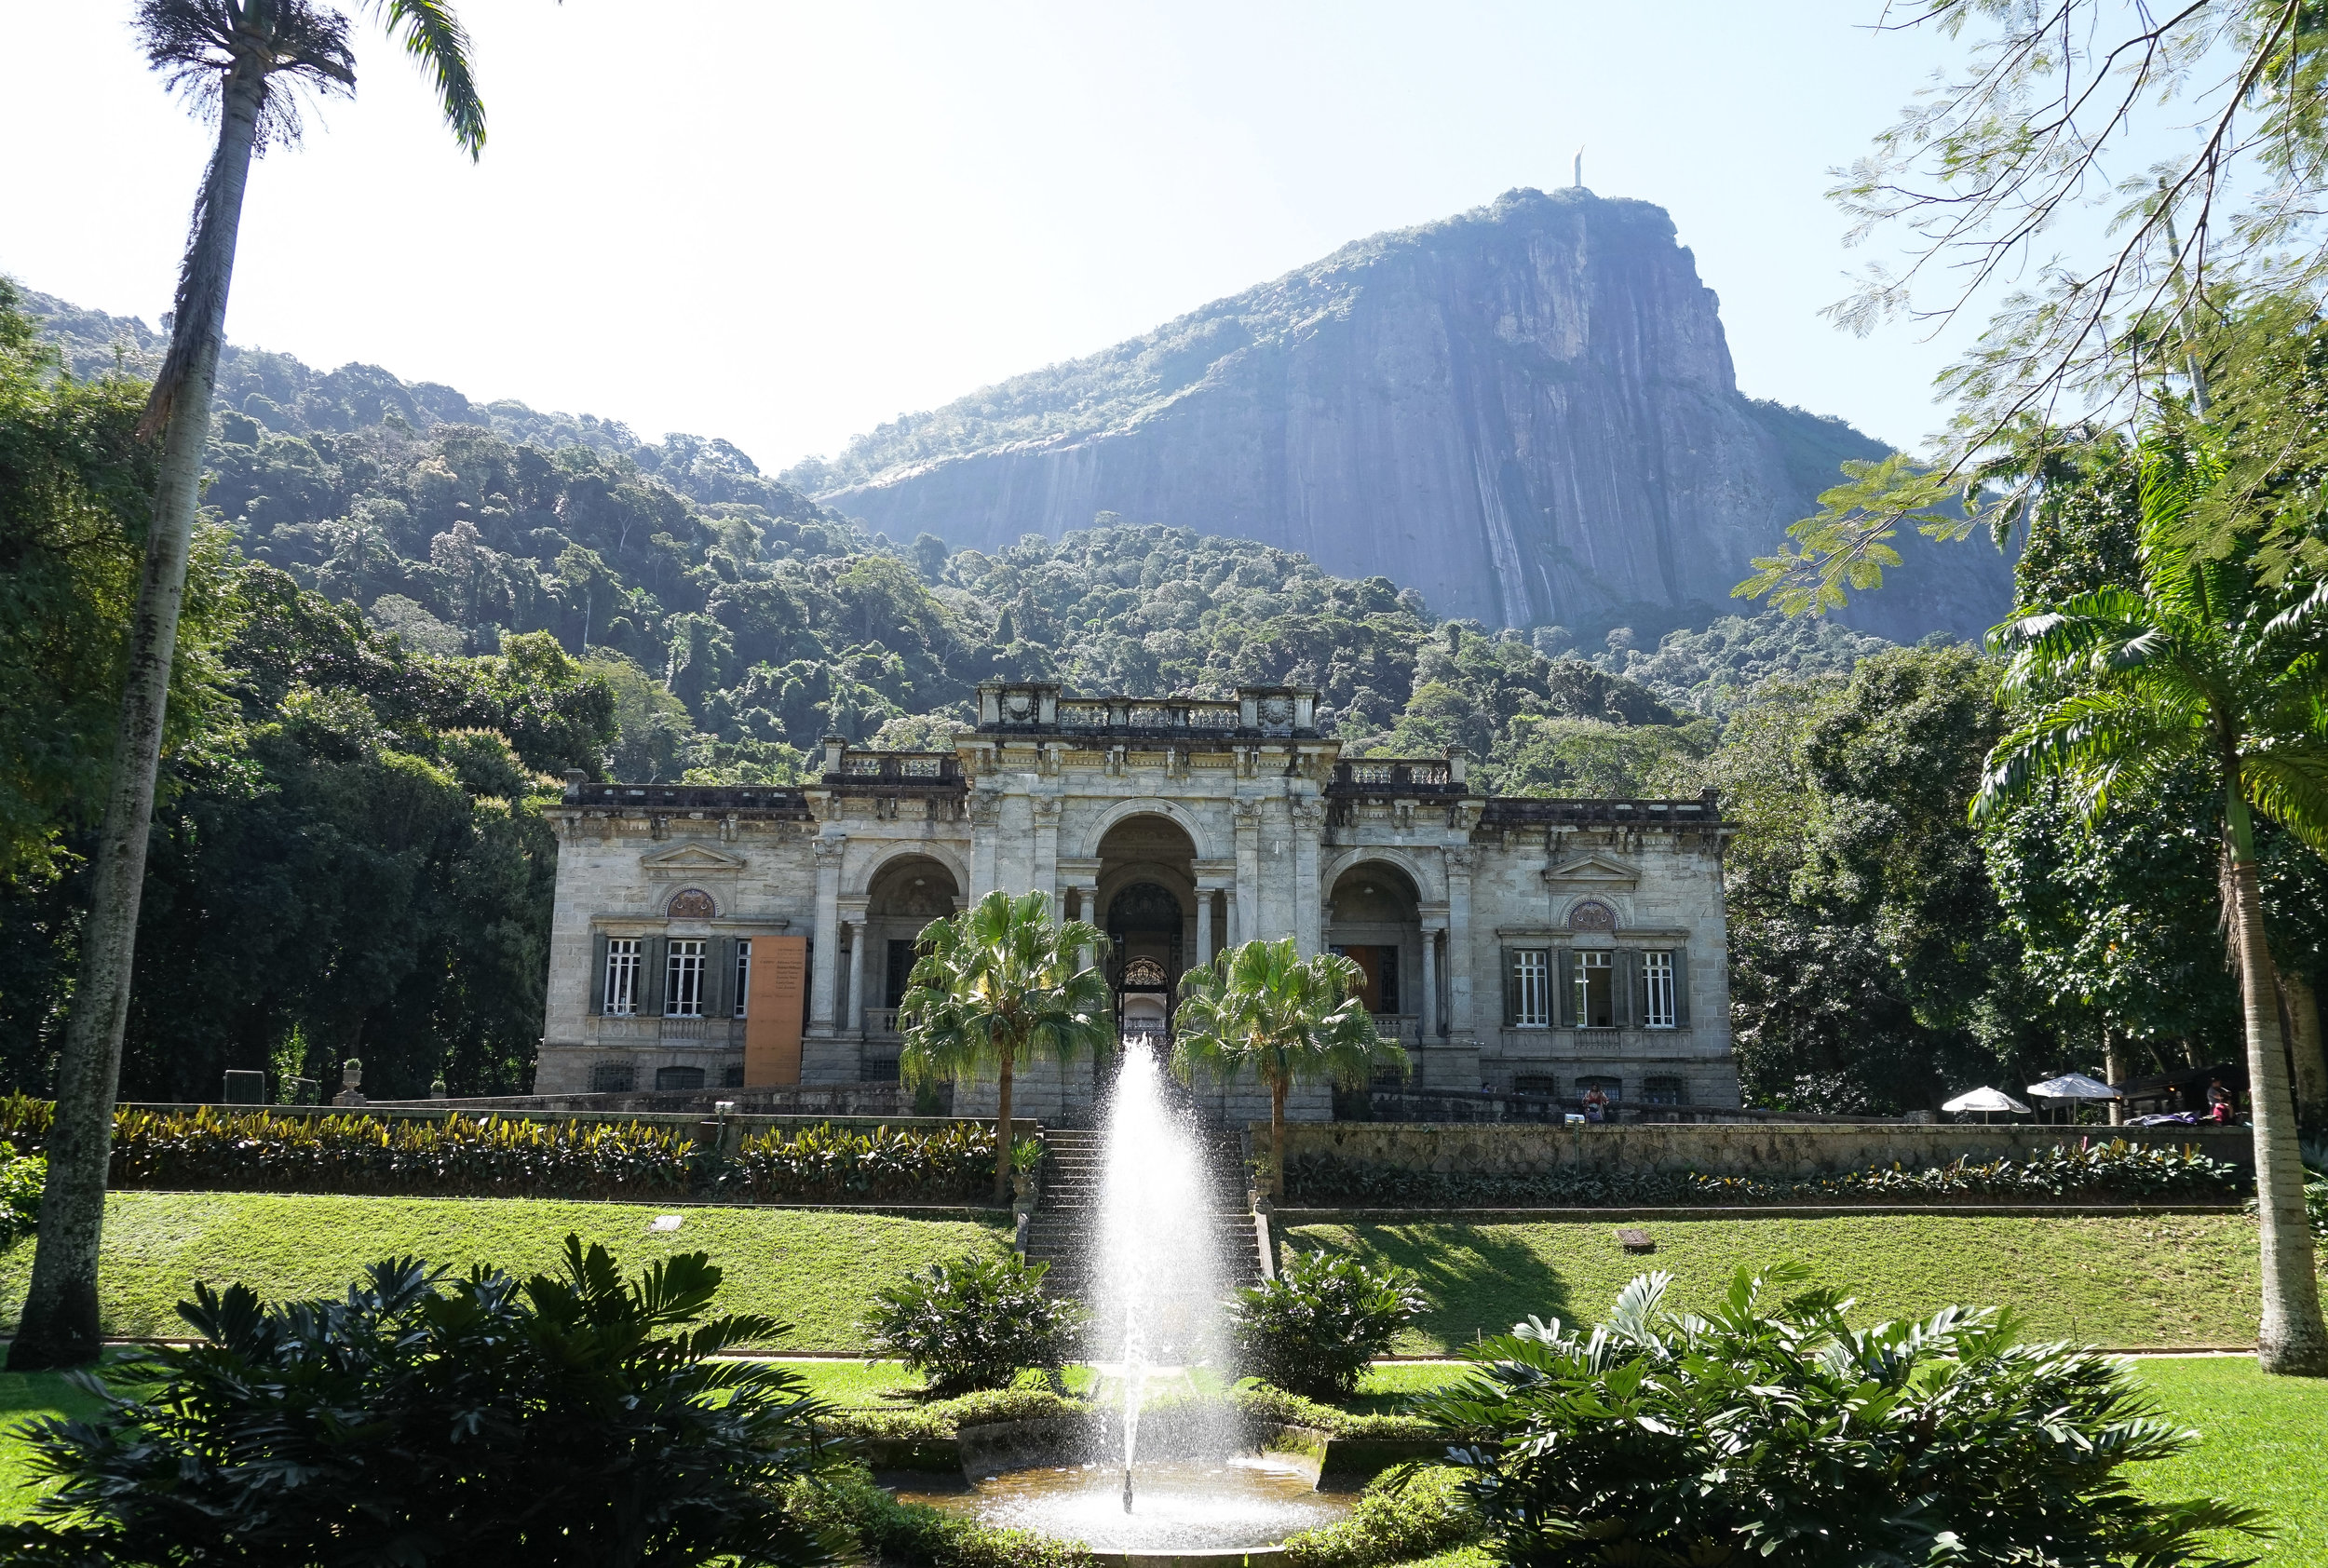 curio.trips.brazil.rio.de.janeiro.park.house.christ.mountain.landscape.jpg